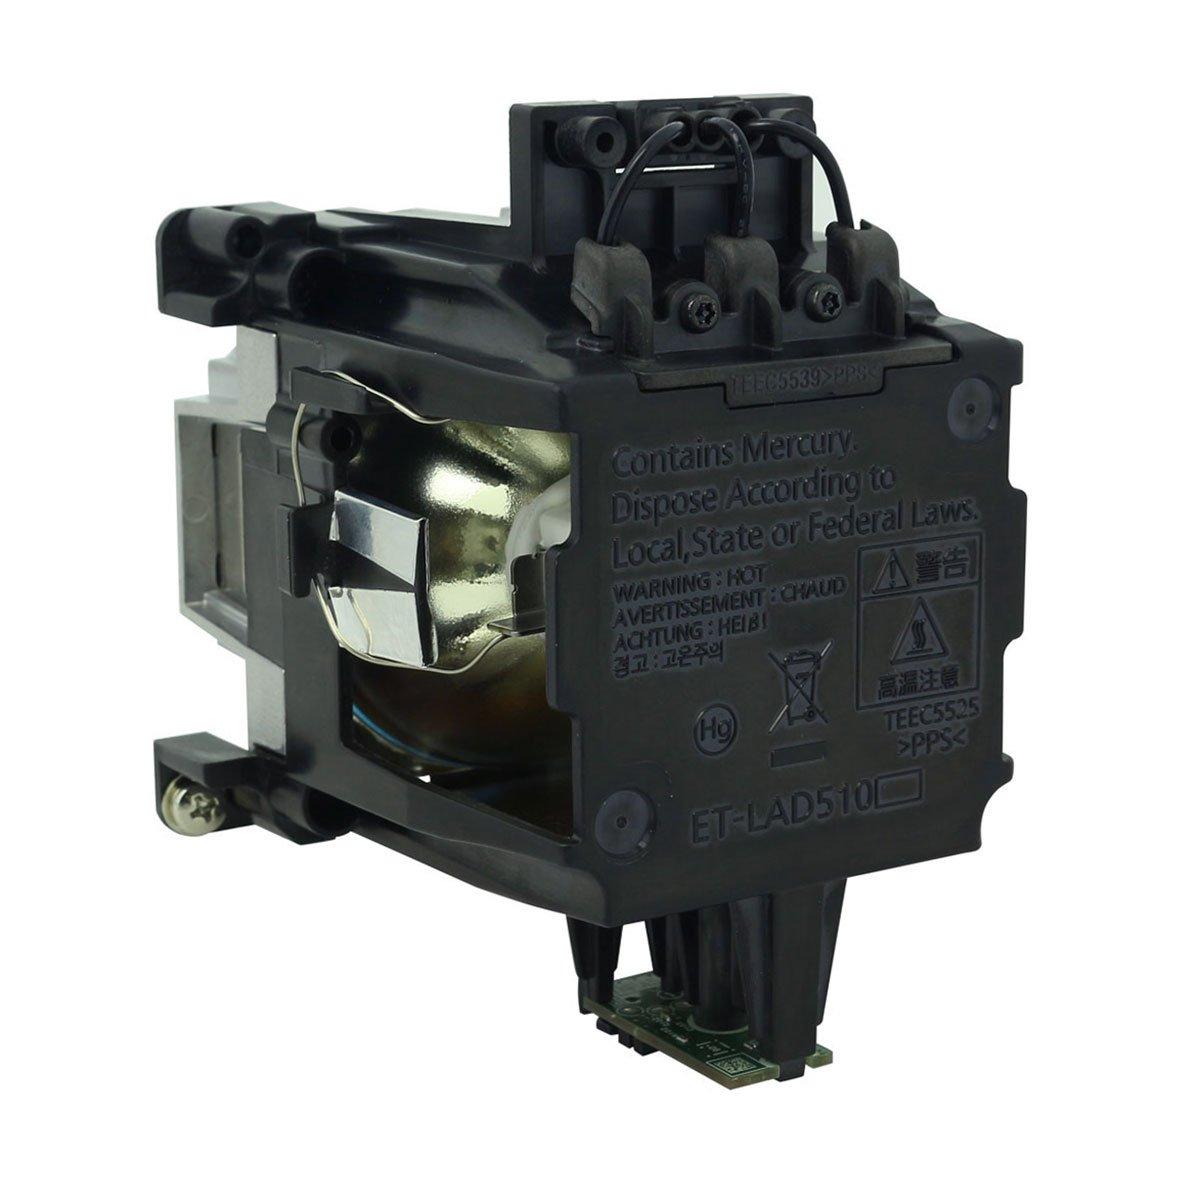 Lytio Premium Panasonic Et Lad510 Projector Lamp Housing Replacement Electric Circuit Etlad510 Original Oem Bulb Inside Electronics